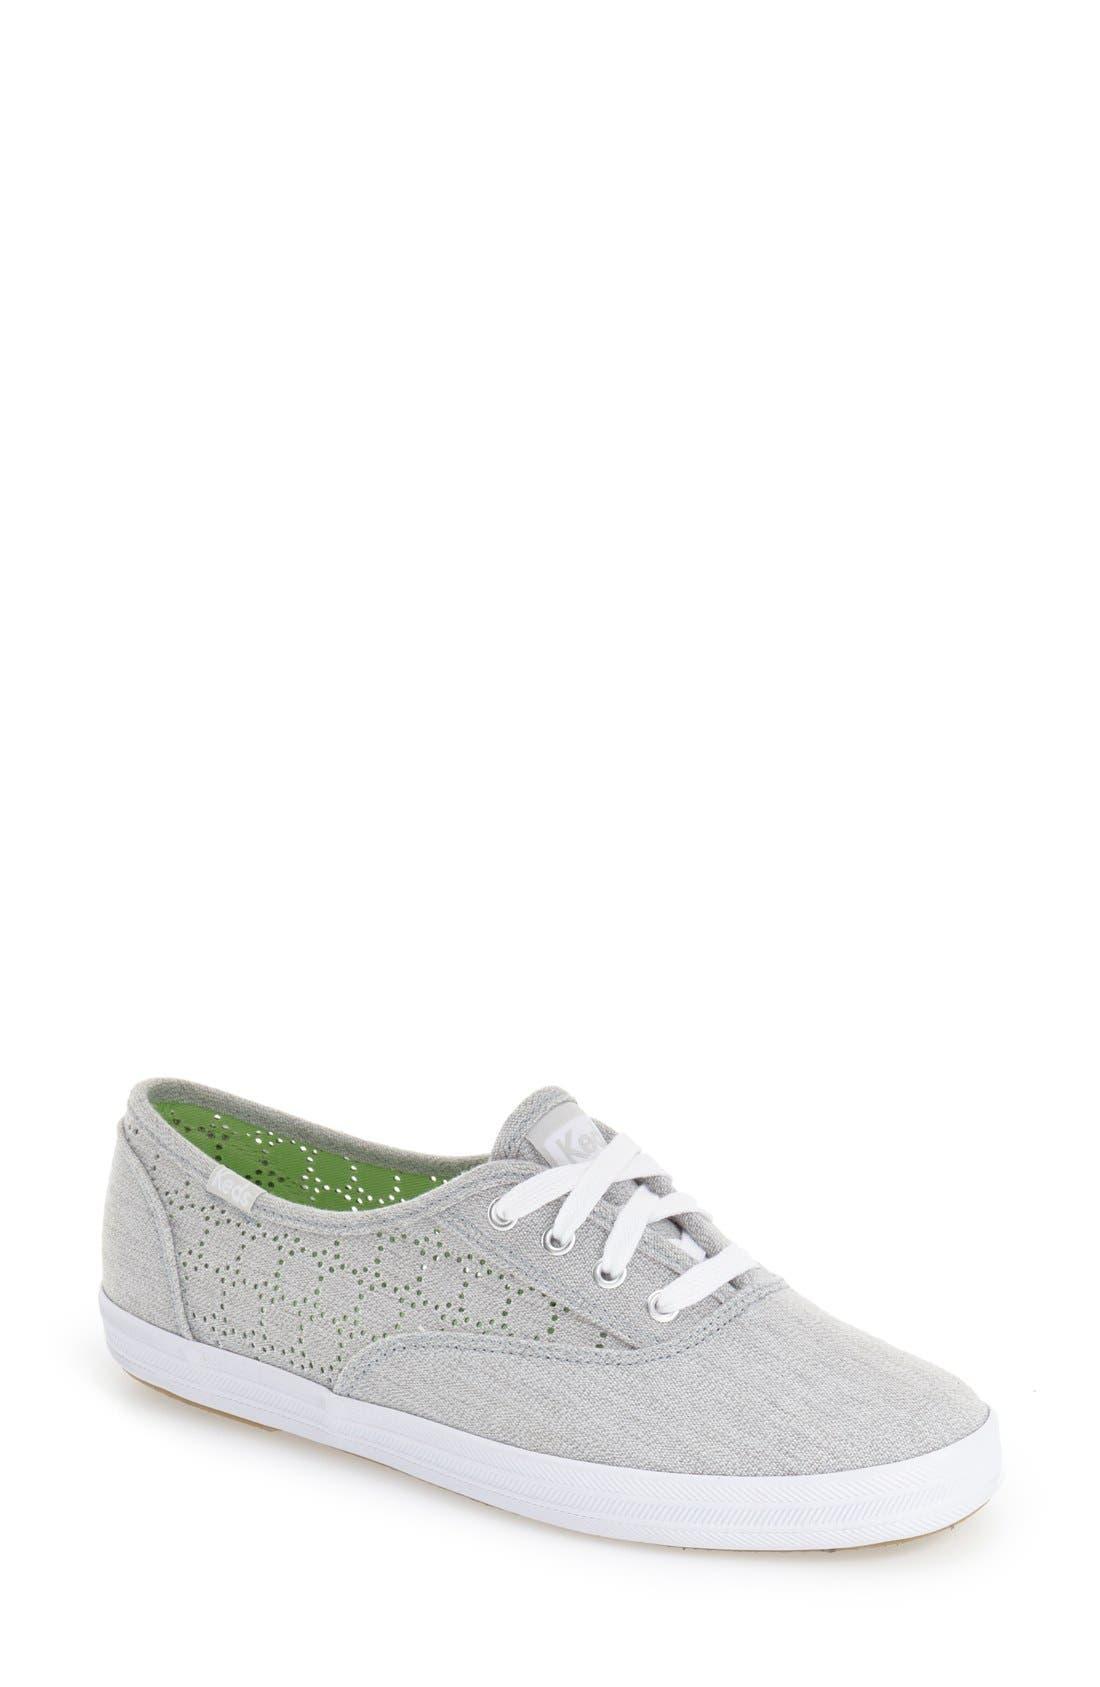 Main Image - Keds® 'Champion' Perforated Sneaker (Women)